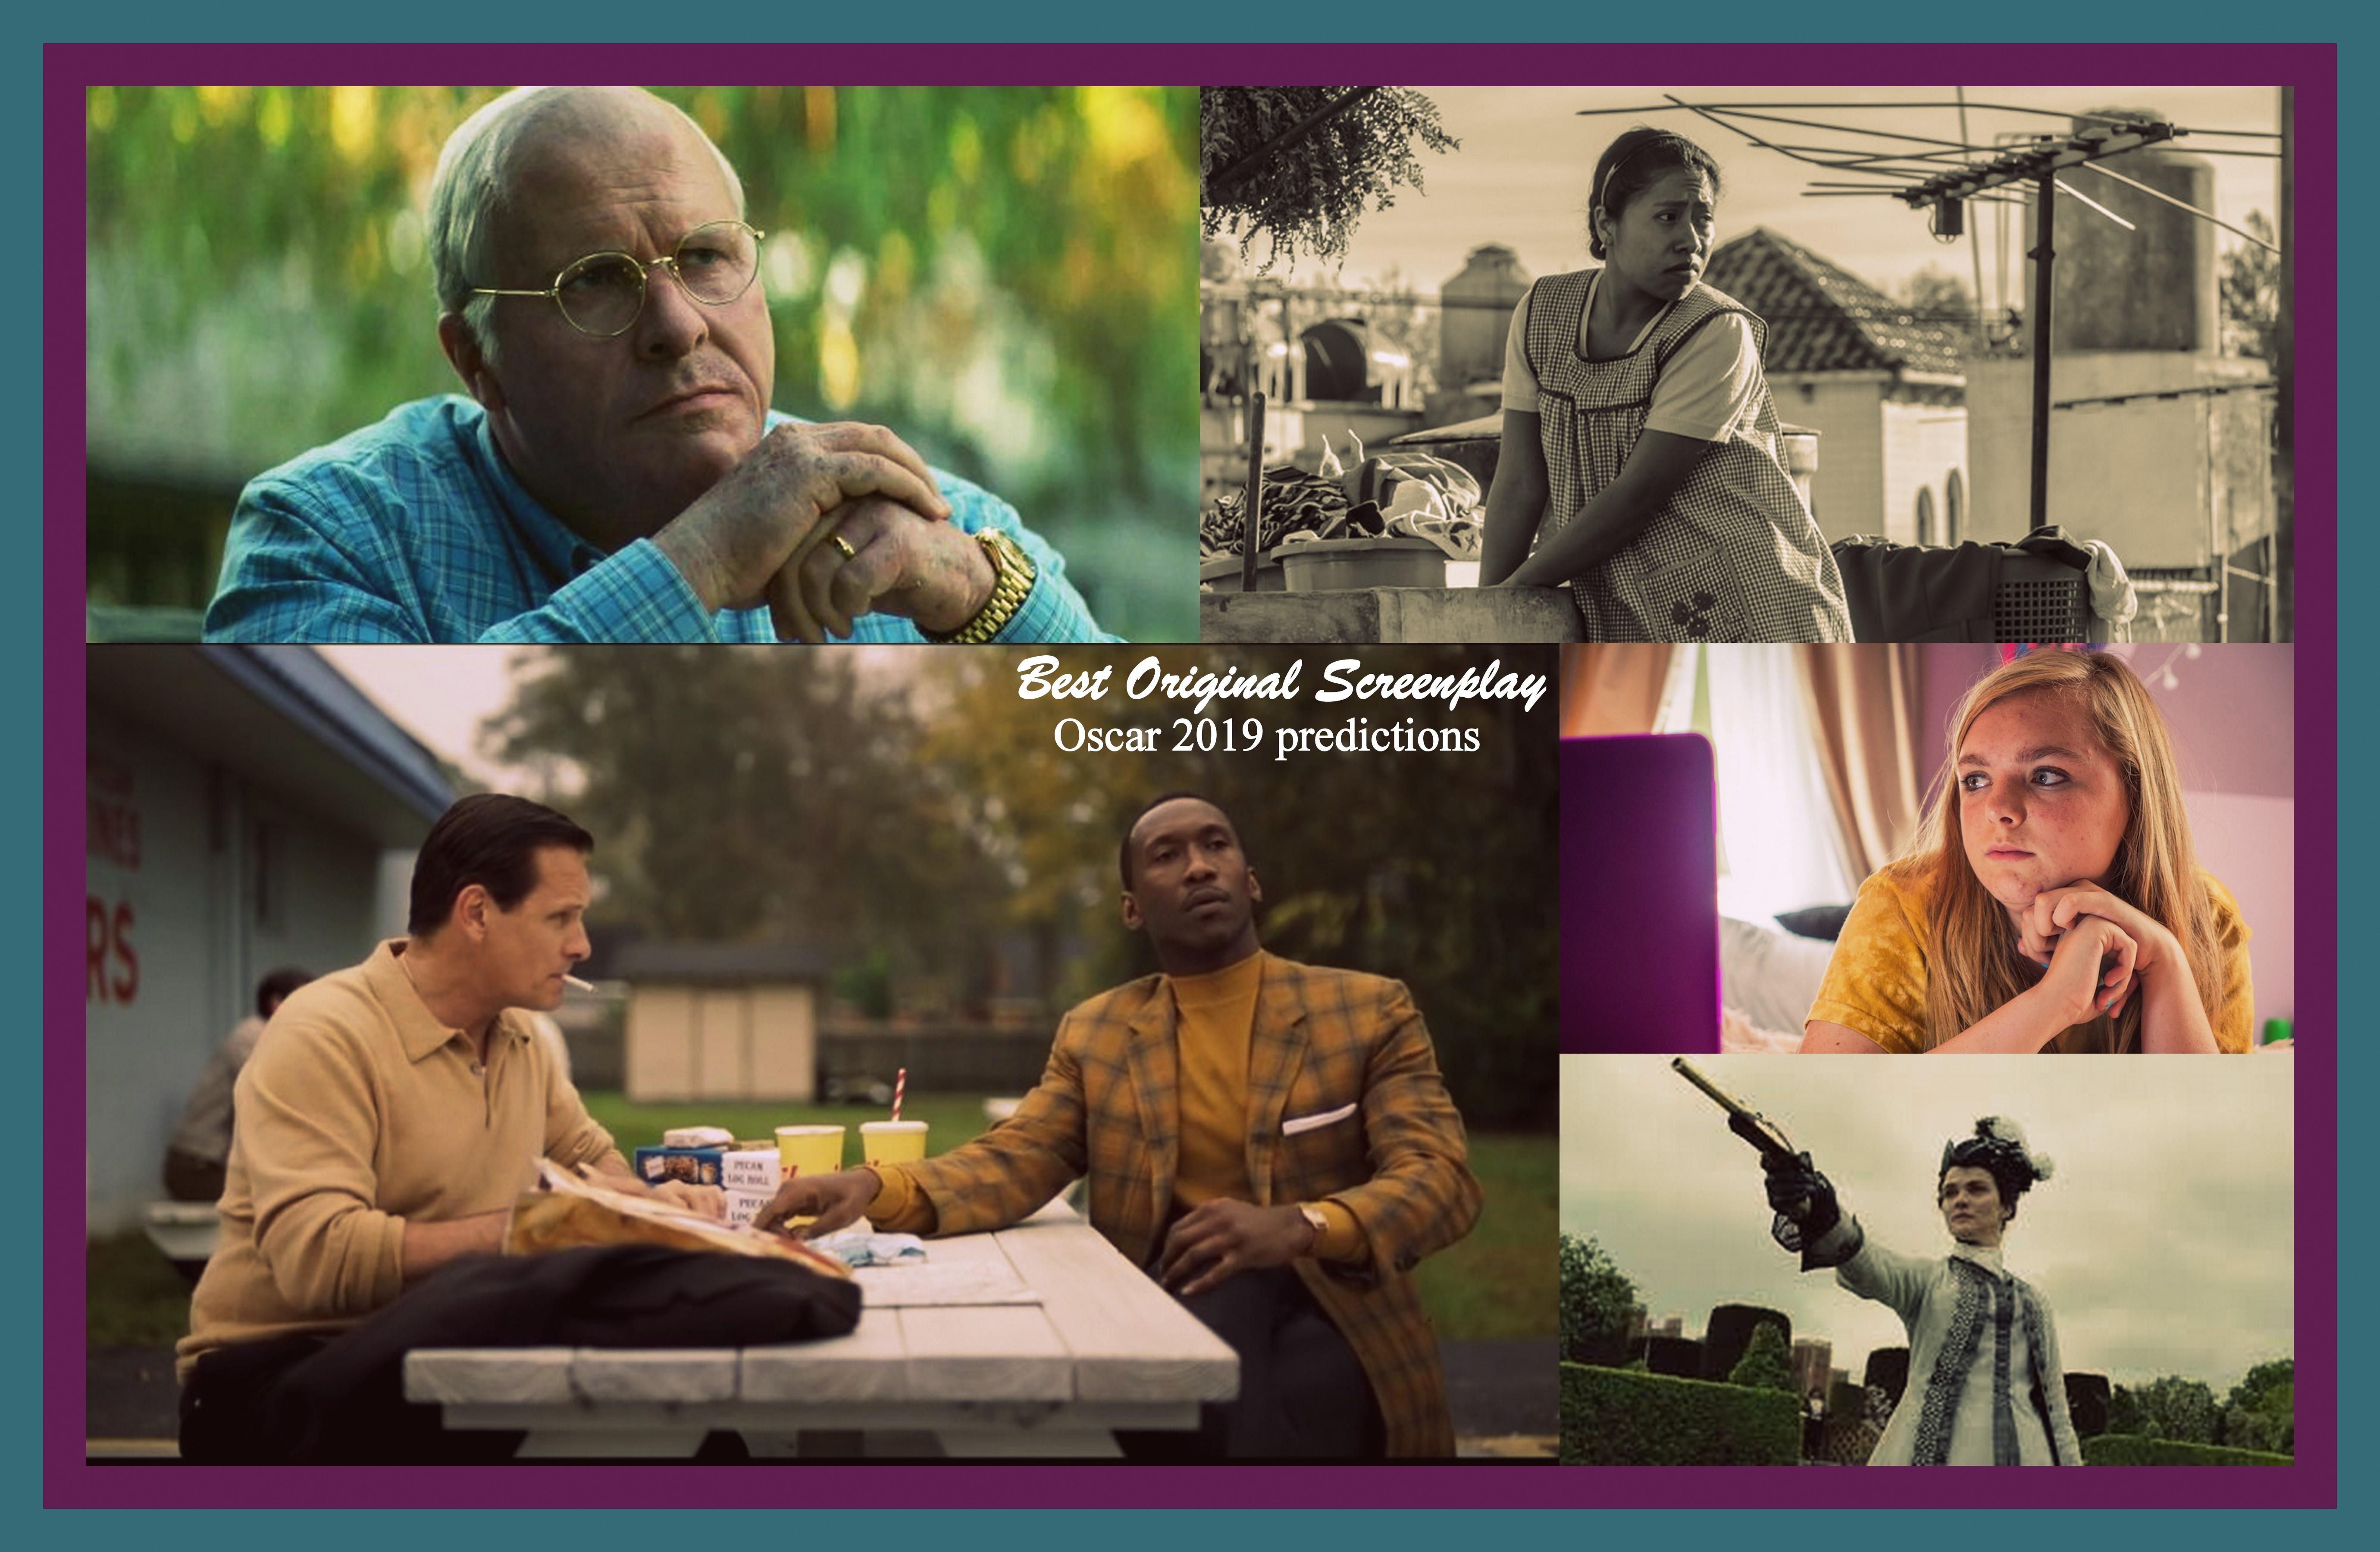 Miglior film straniero 2019 candidating